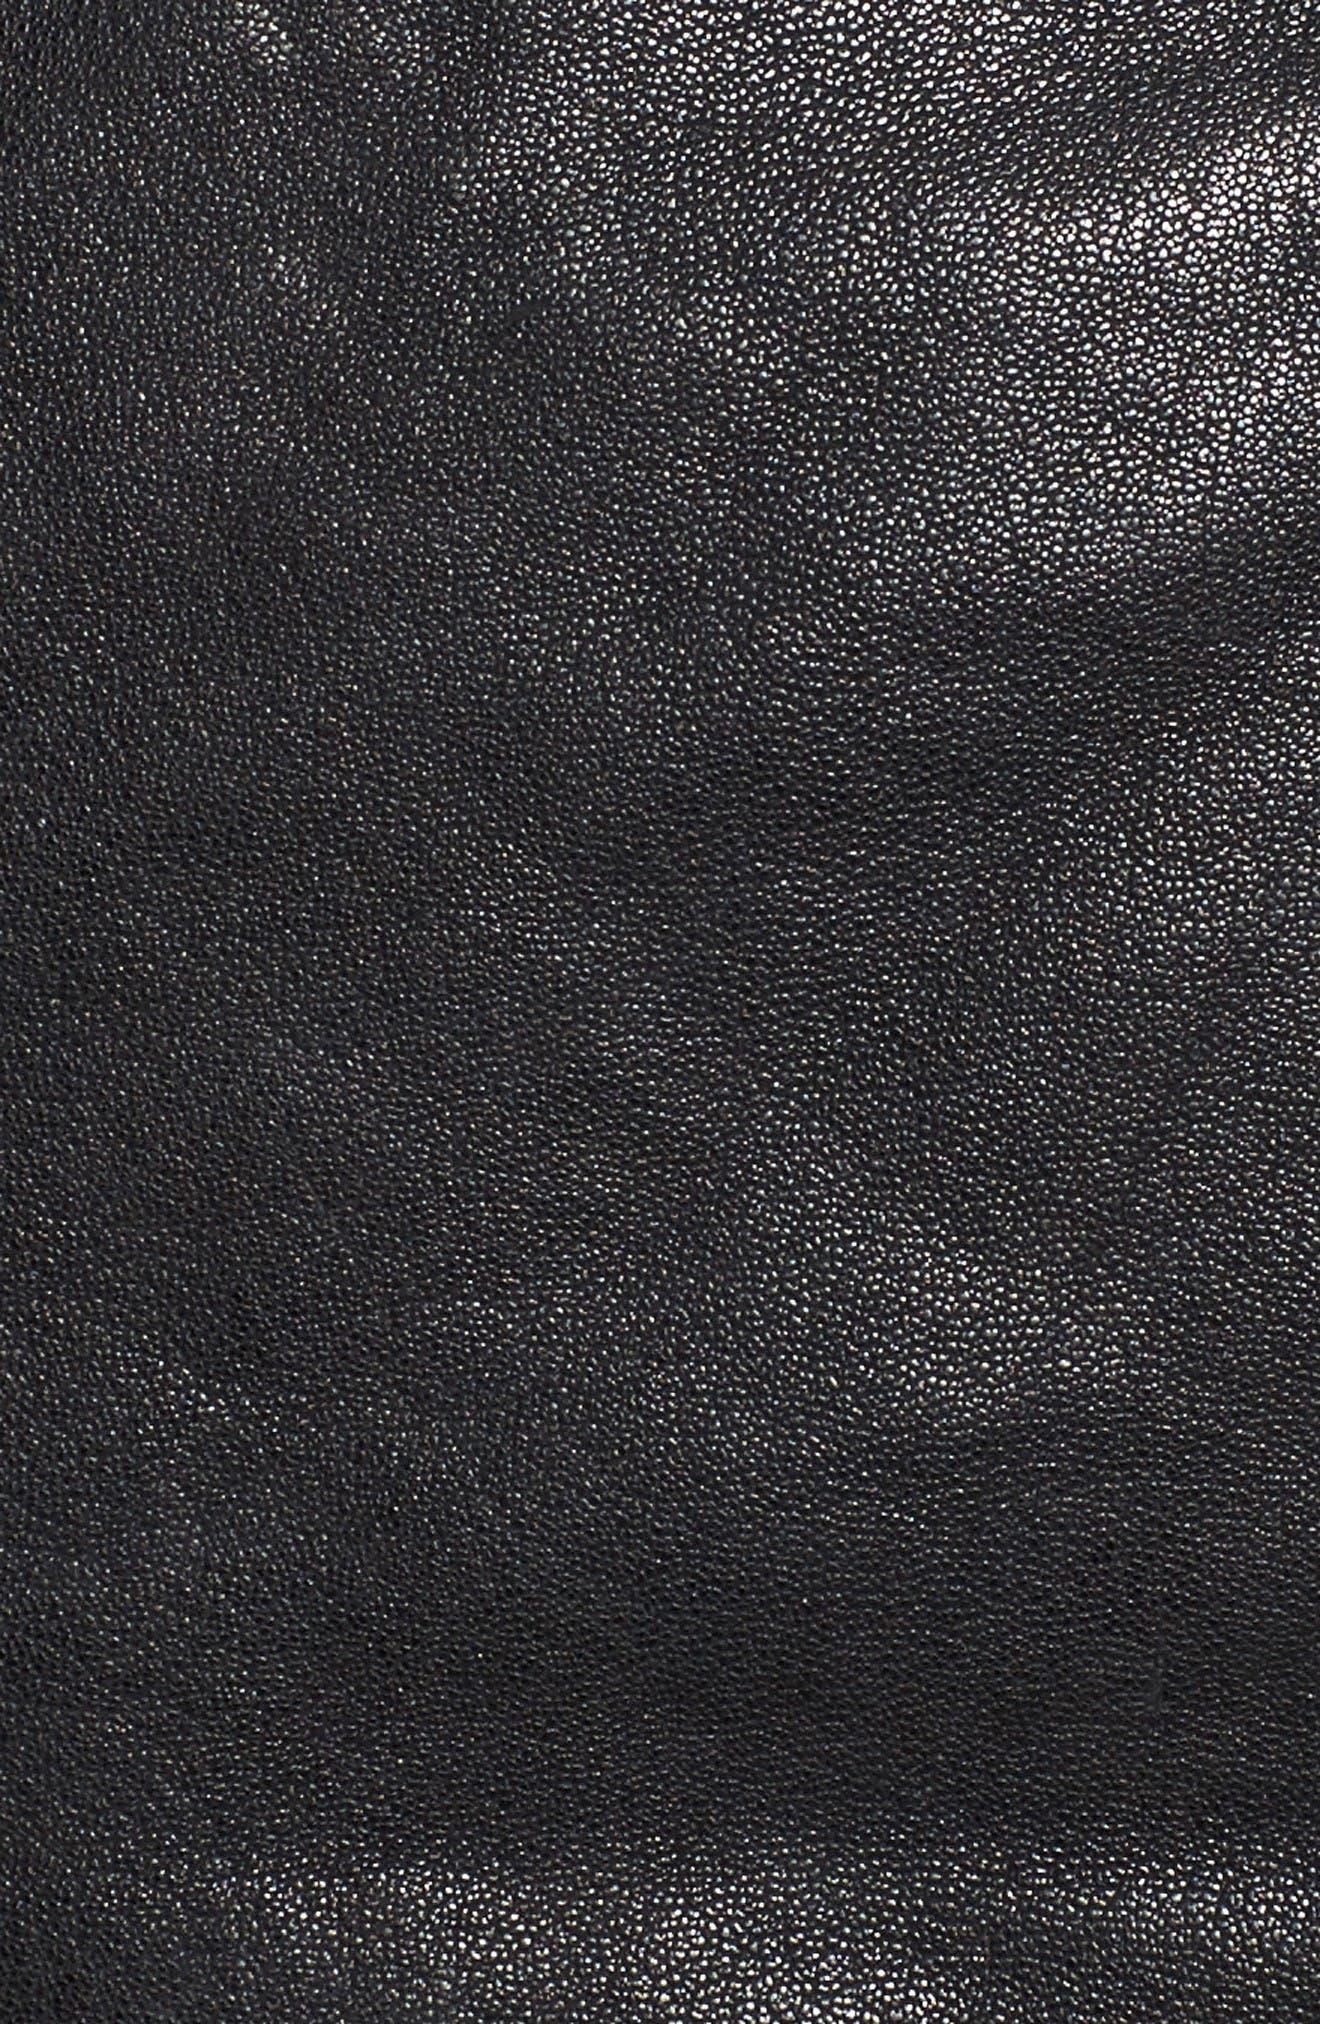 Washed Leather Crop Moto Jacket,                             Alternate thumbnail 5, color,                             Black